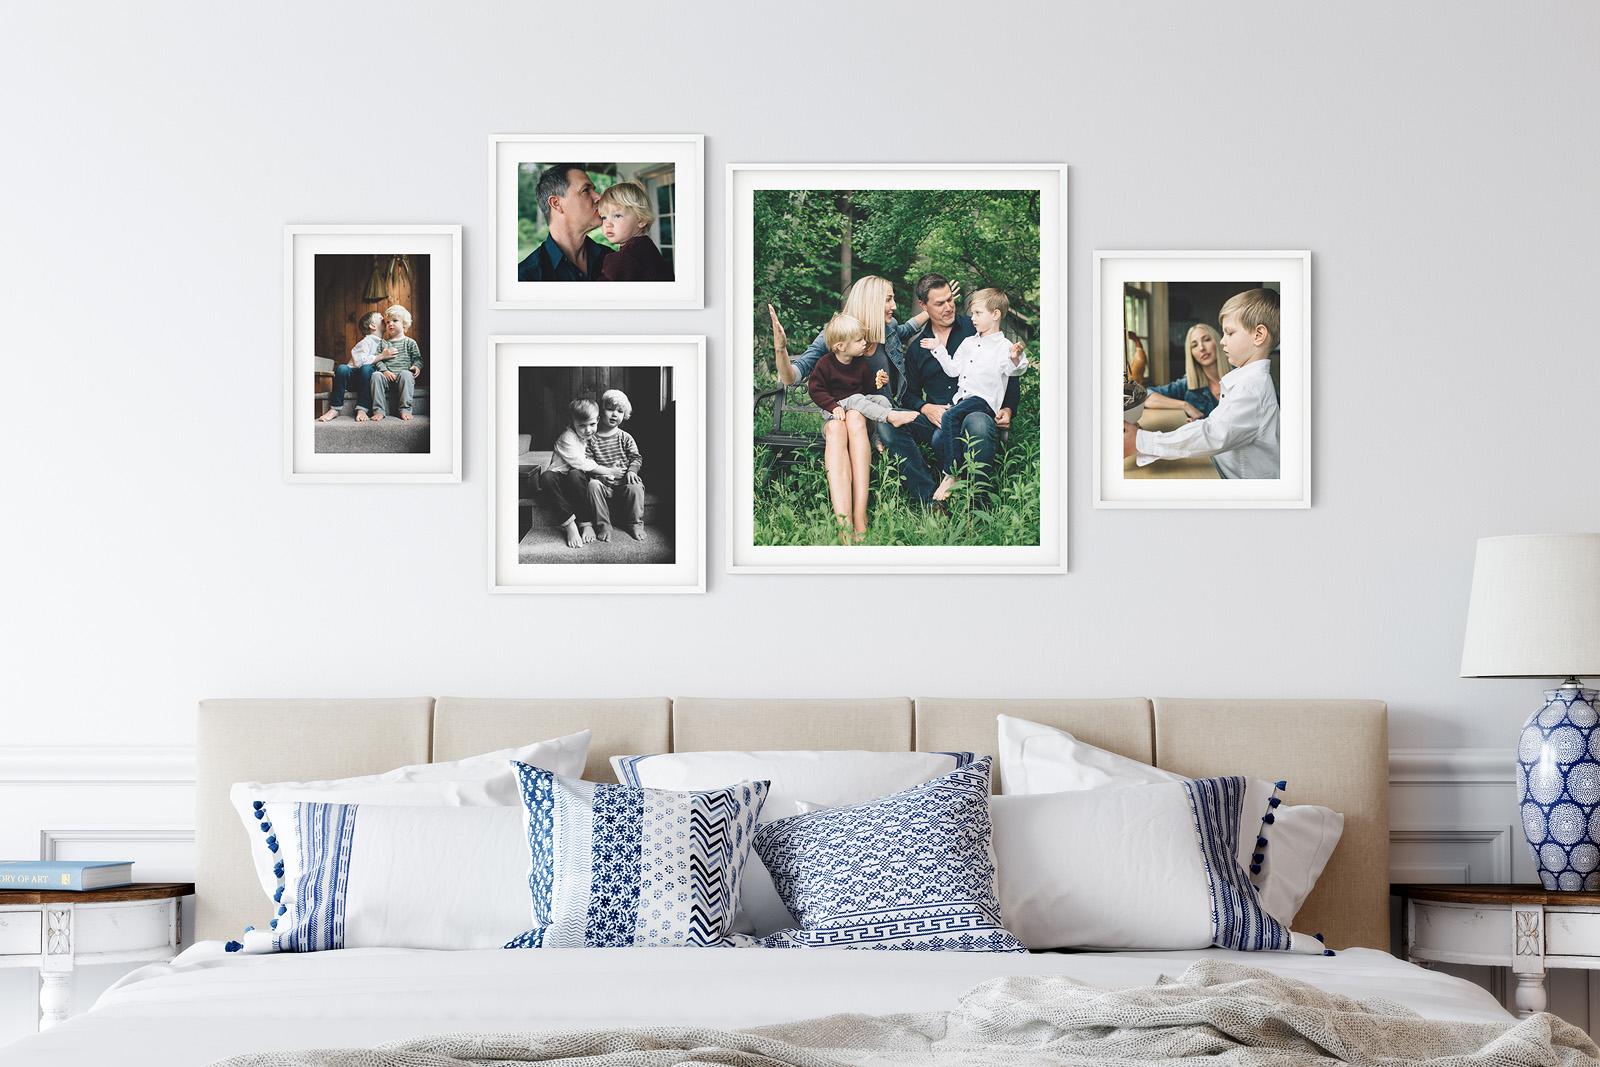 Wall art collection by Birch Blaze Studios, NH Portrait photographers.